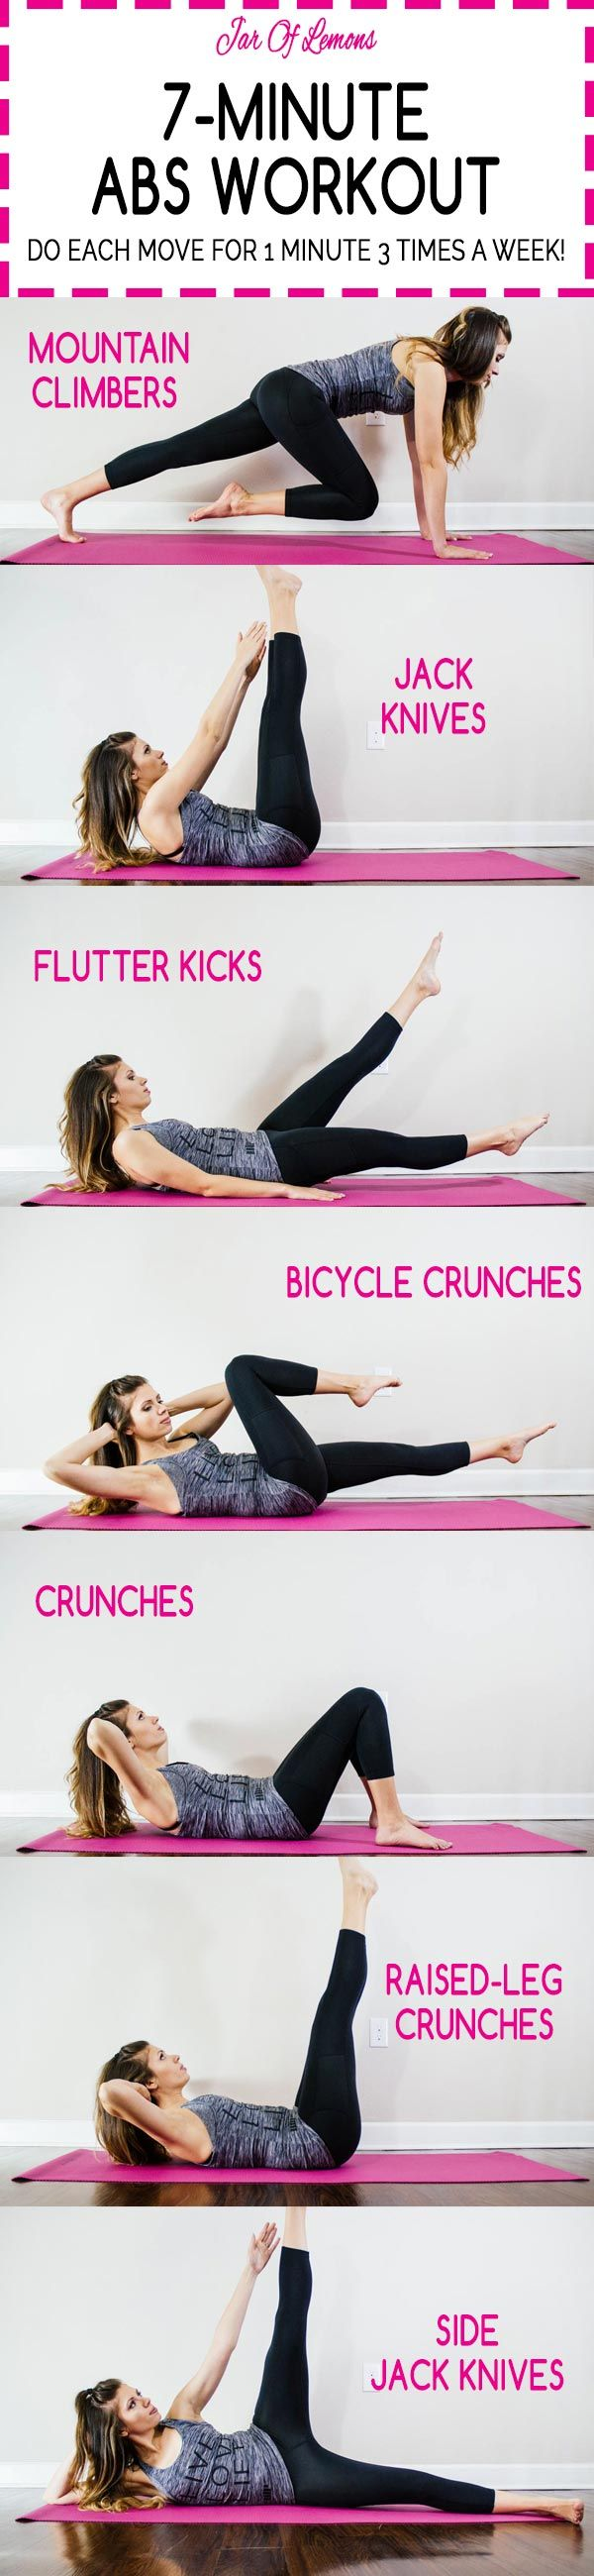 7-Minute Abs Workout - Jar Of Lemons